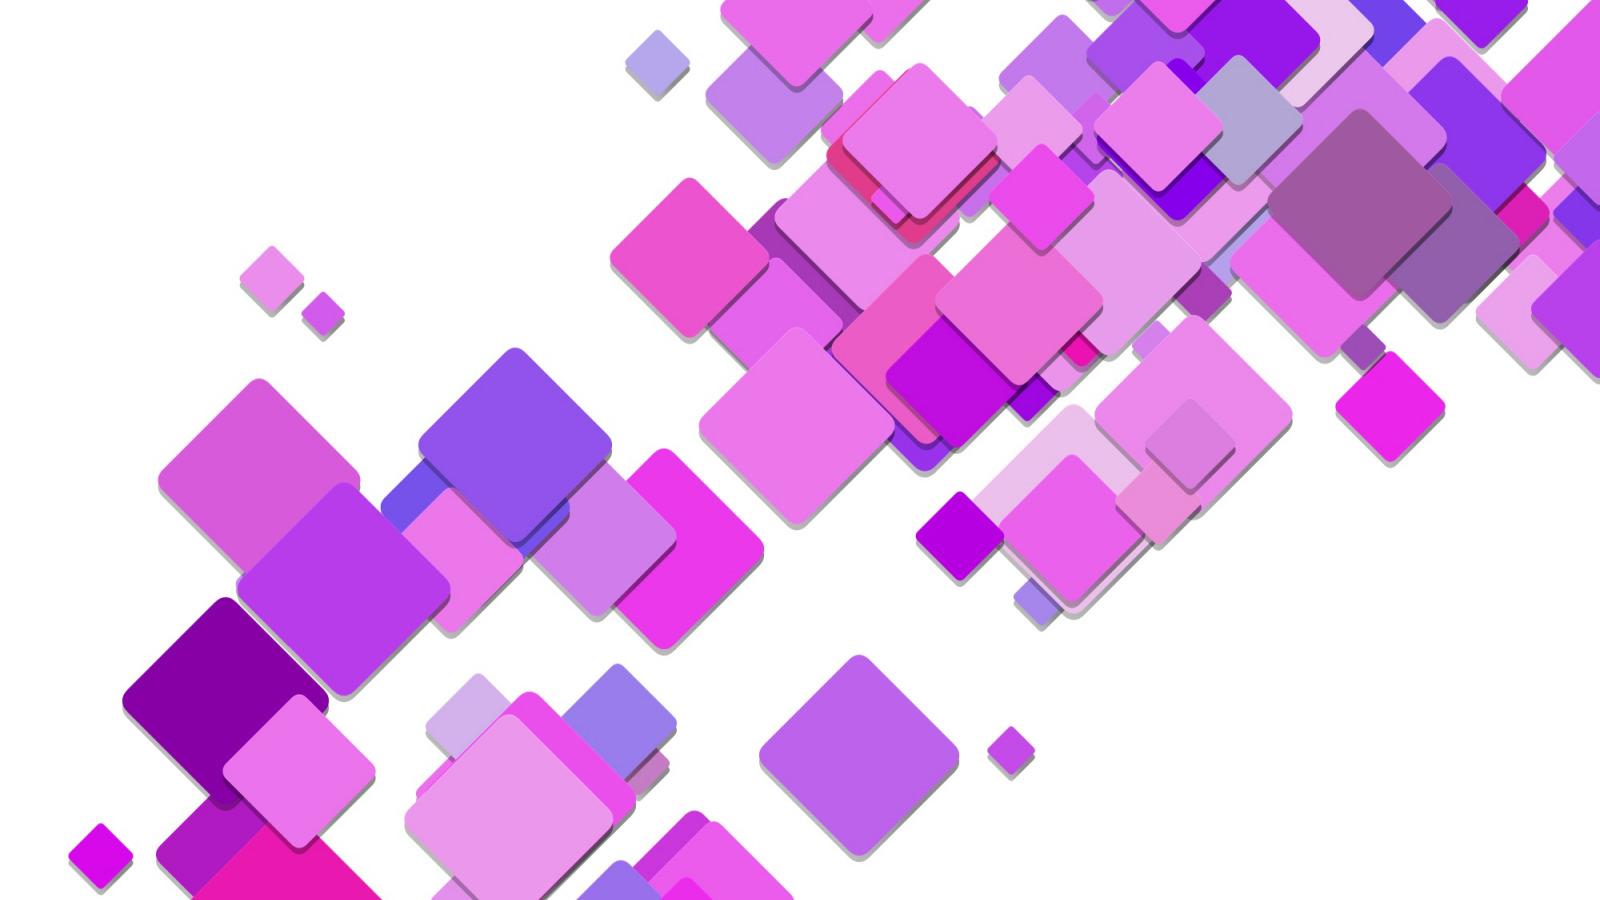 Картинки для презентации квадраты